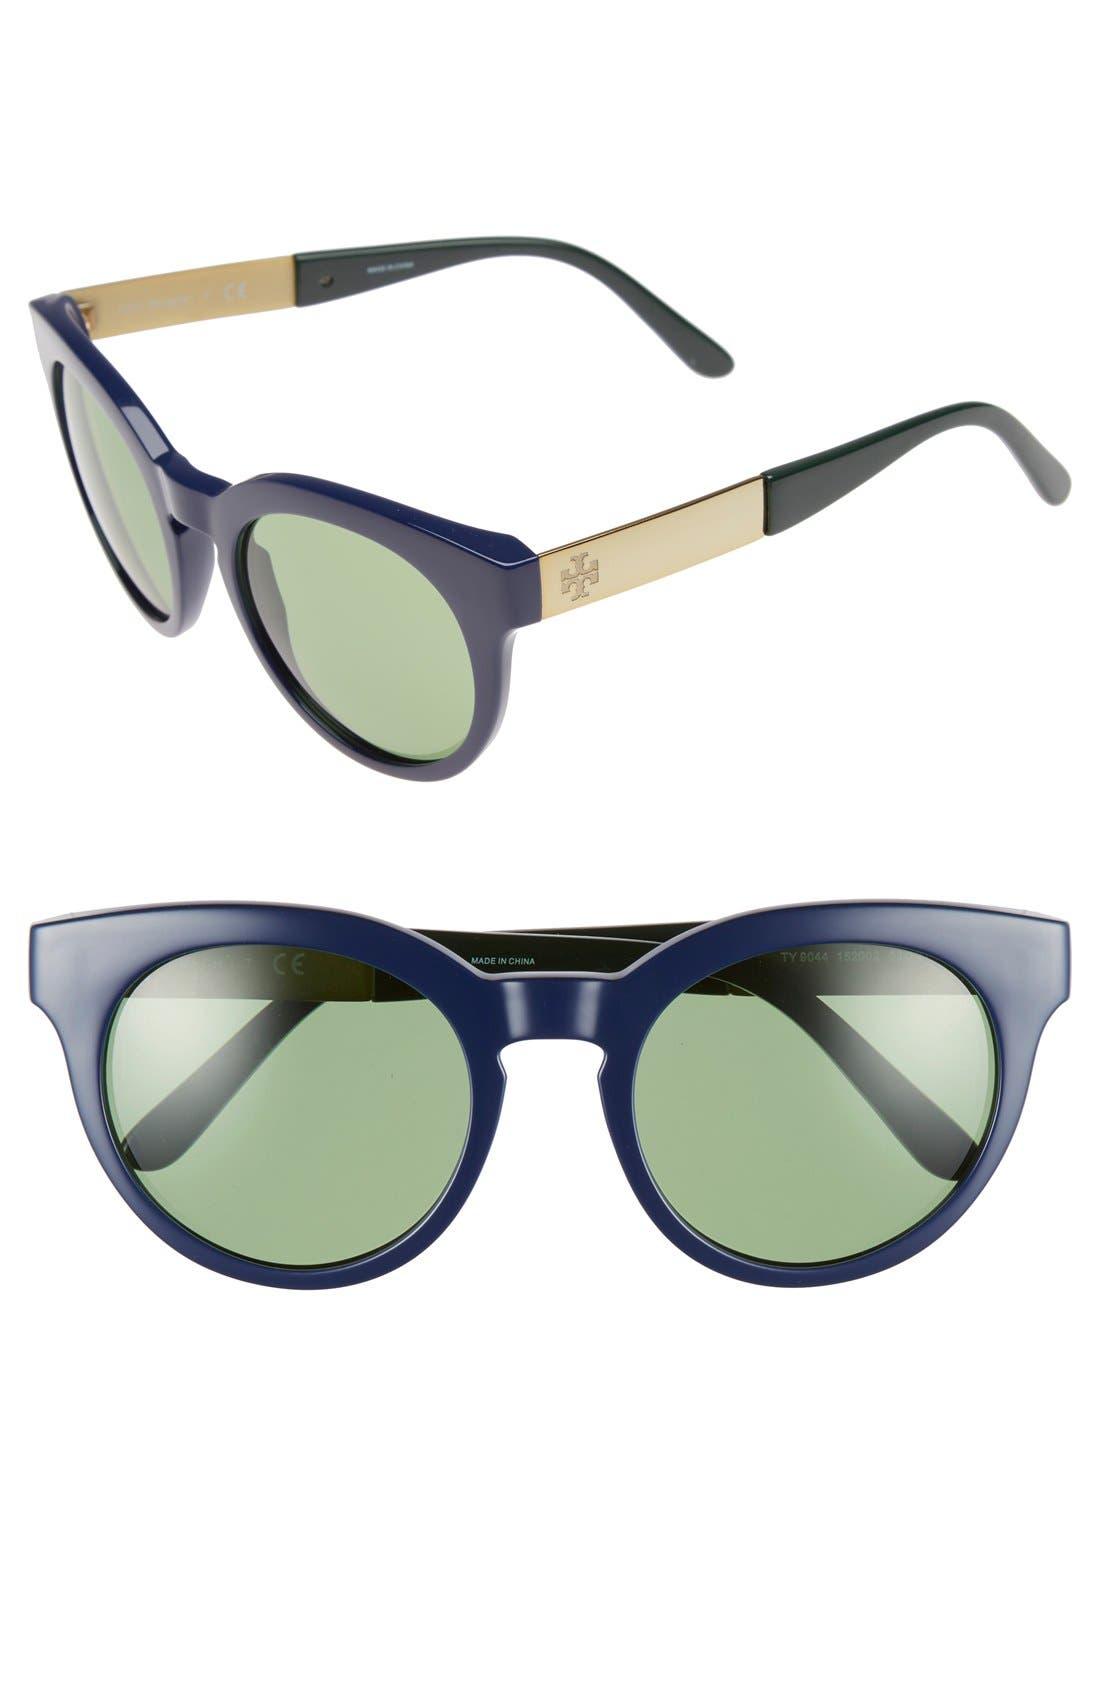 Main Image - Tory Burch 52mm Retro Sunglasses